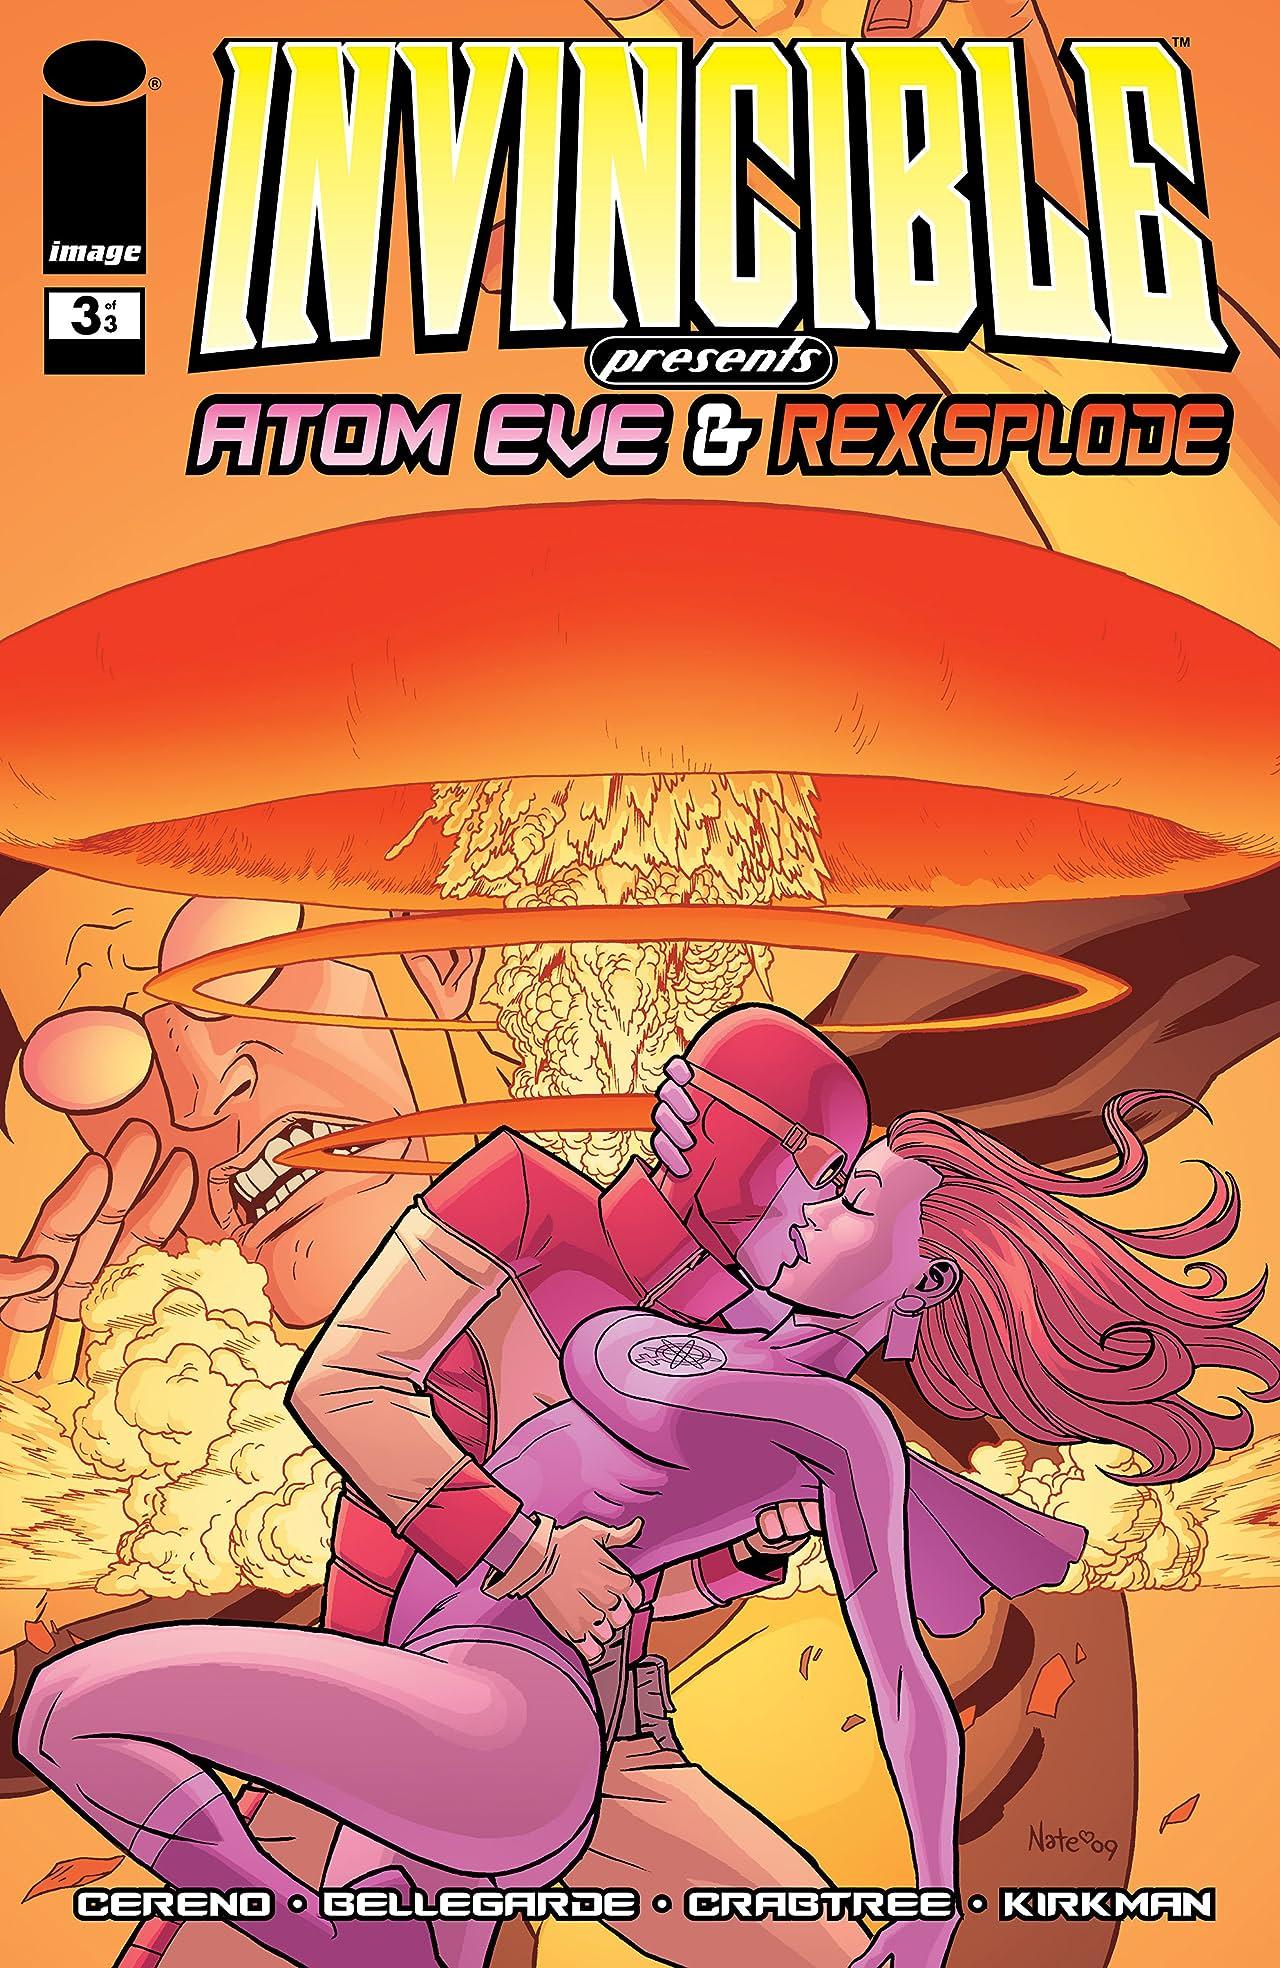 Invincible Presents: Atom Eve & Rex Splode #3